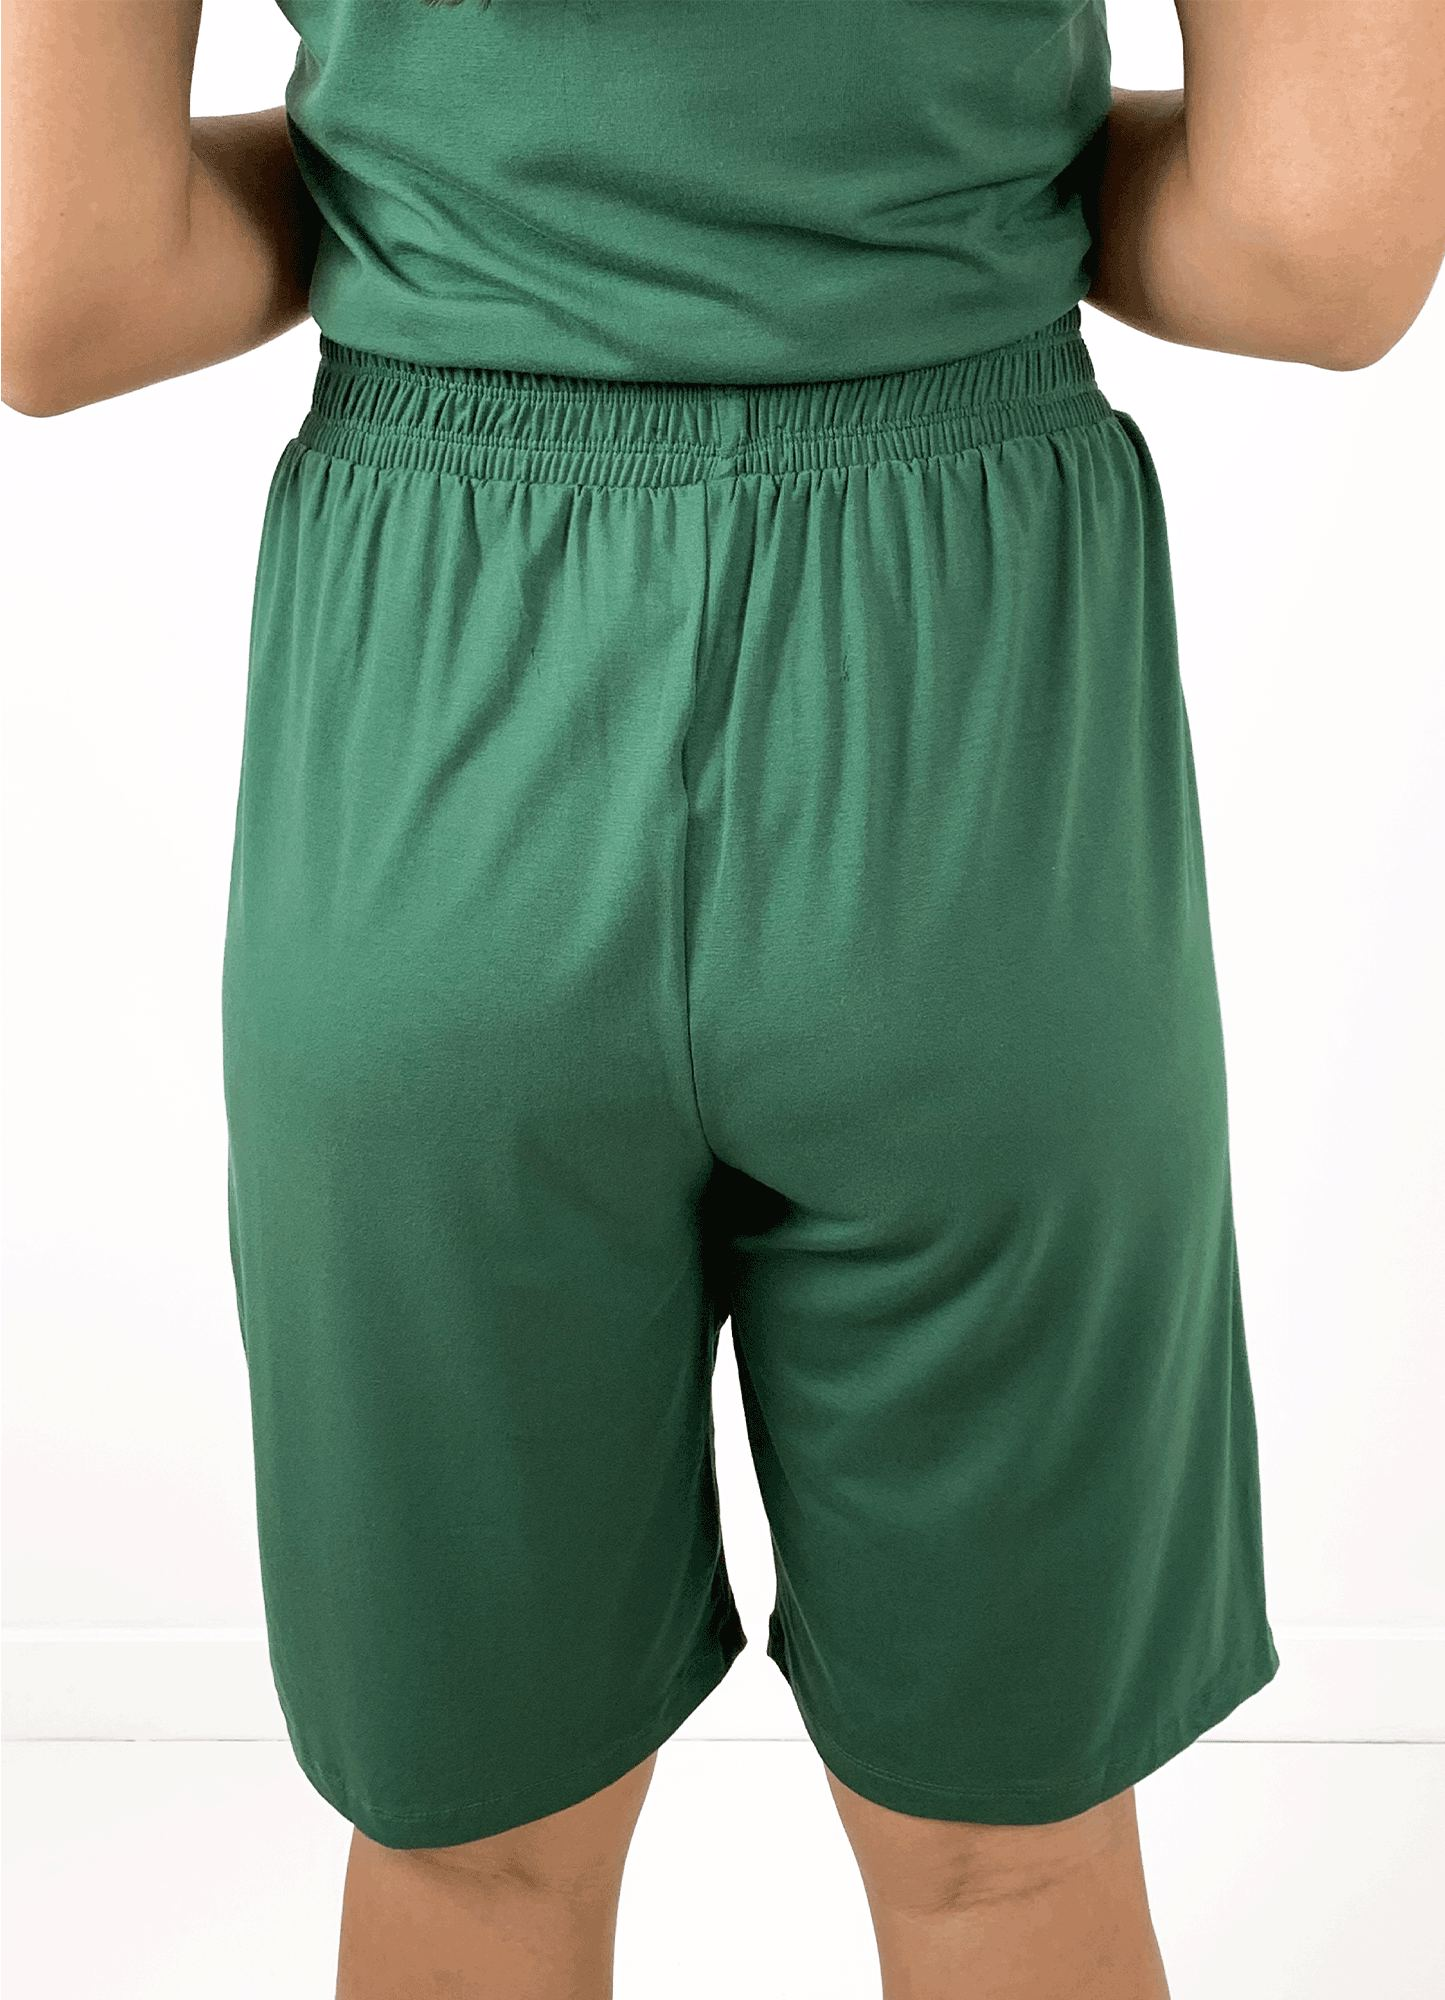 Bermuda Feminina Plus Size Malha Bicolor Cós Elástico Friso Lateral